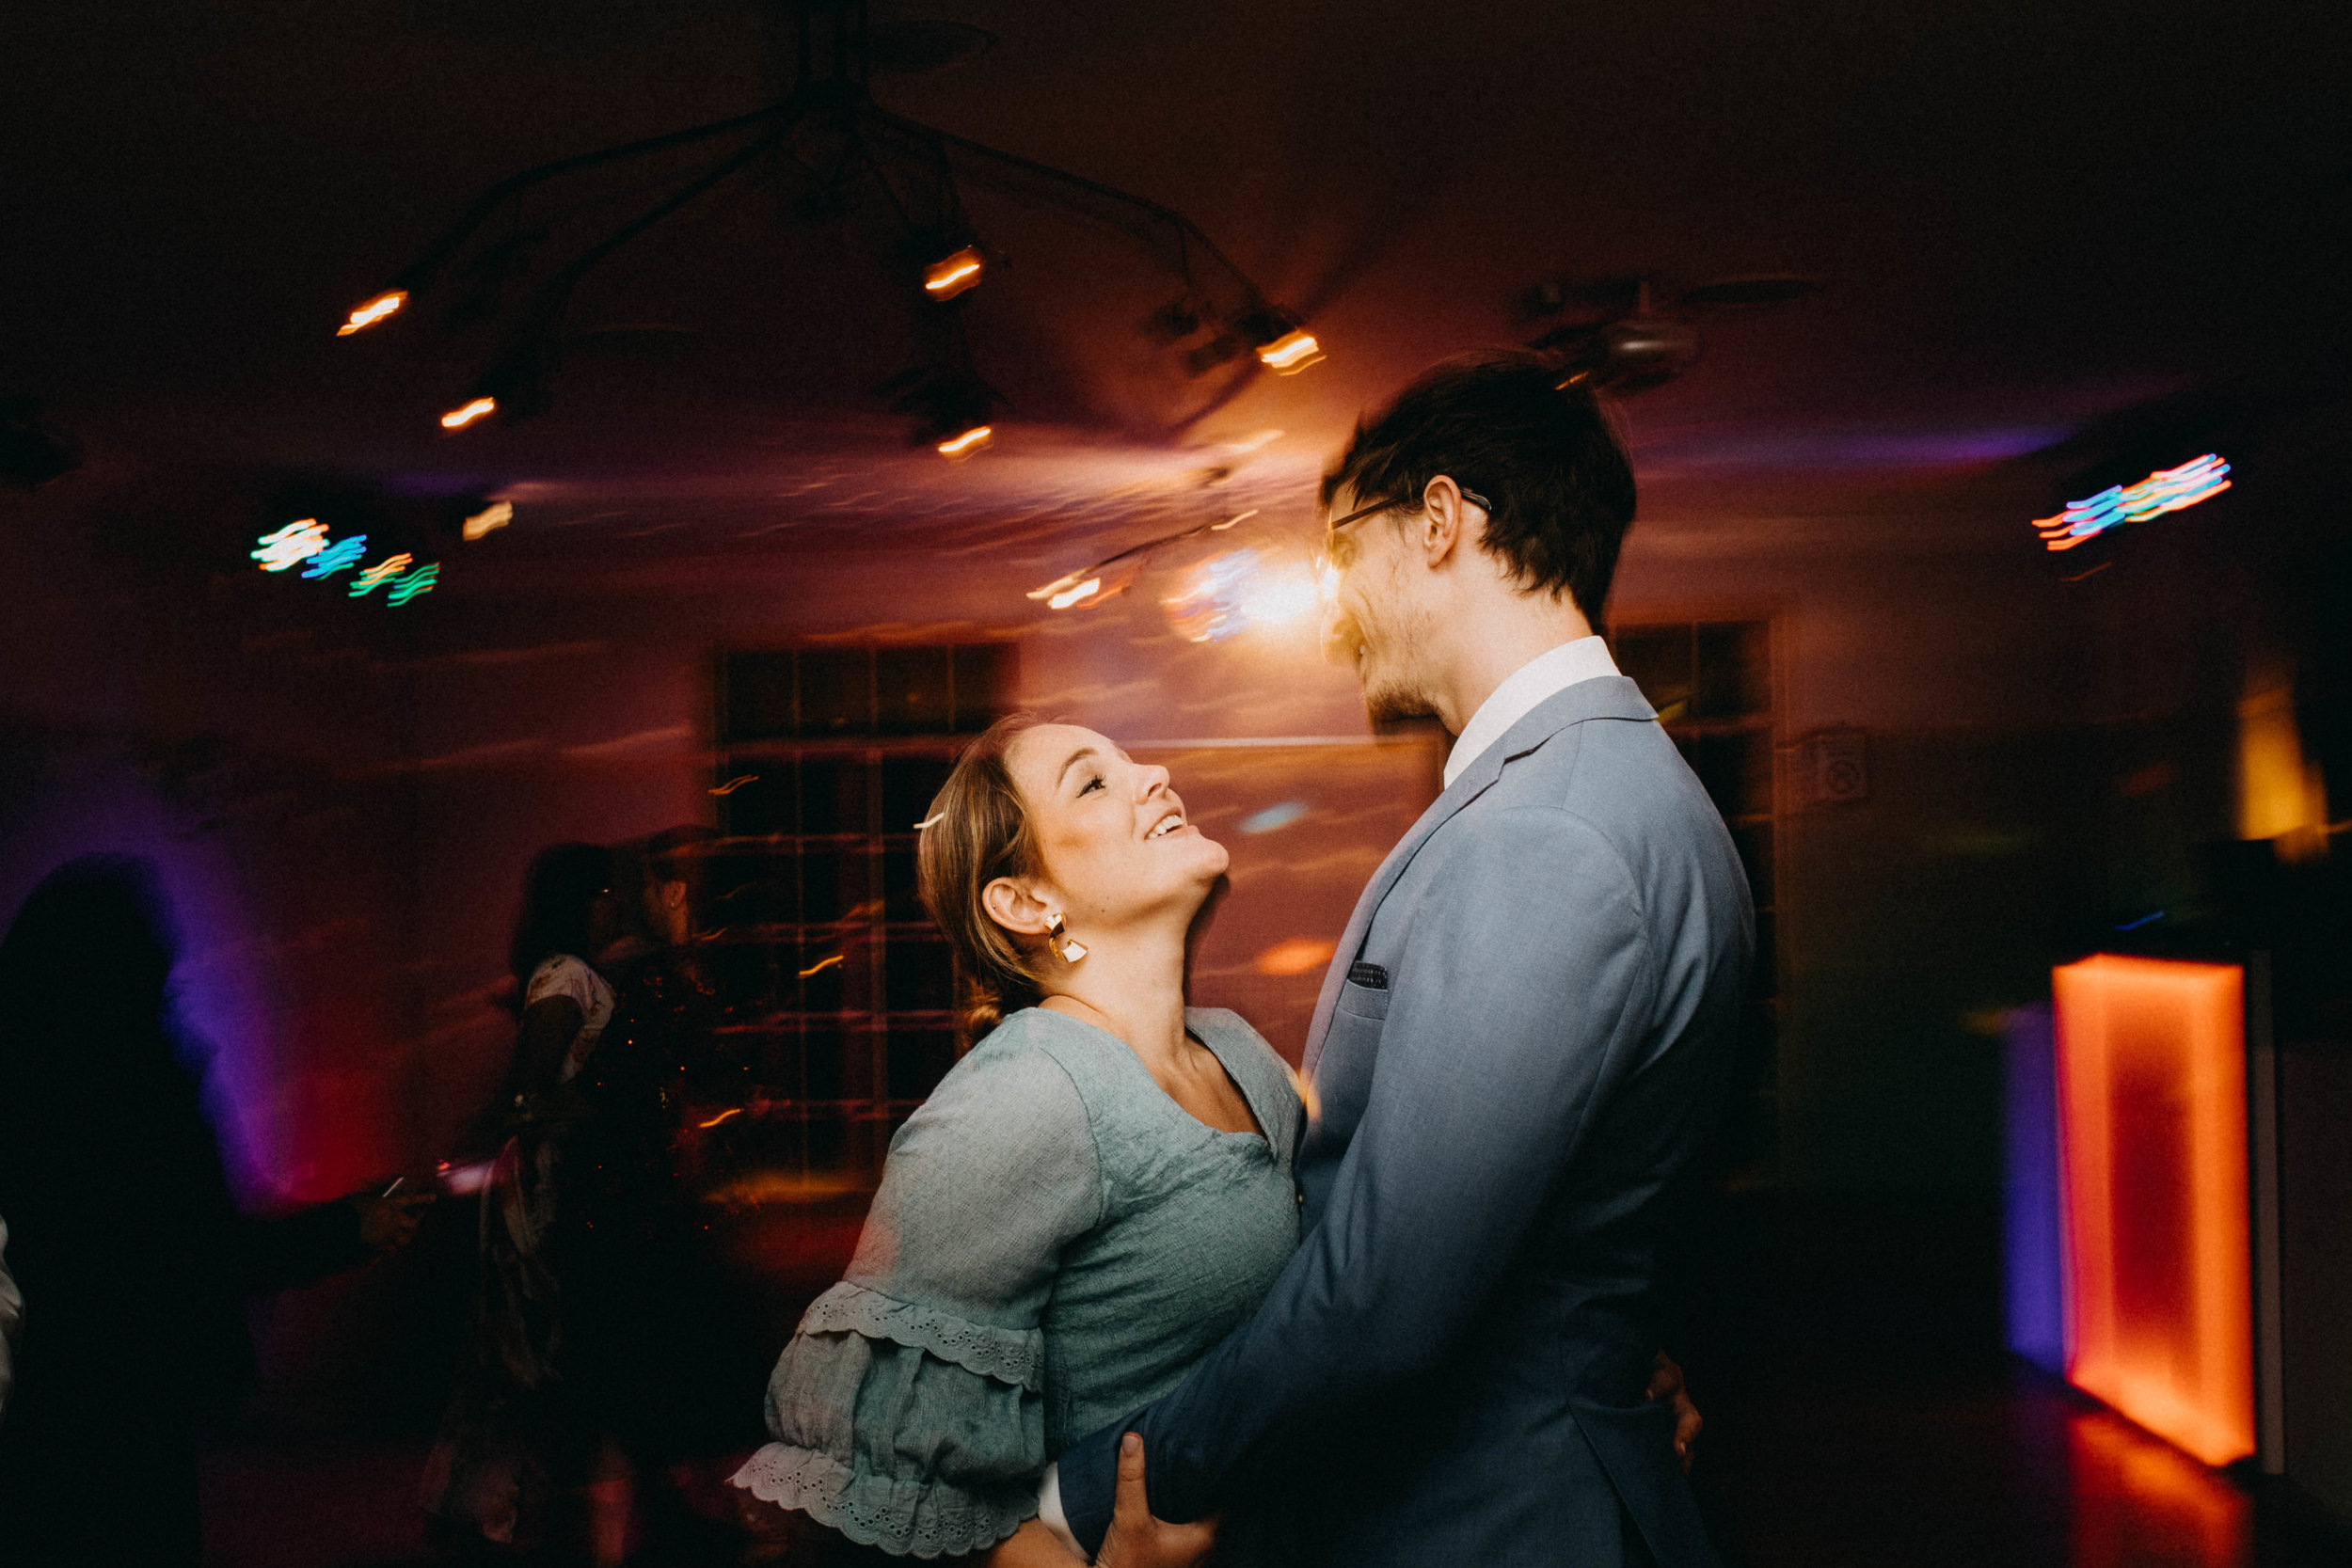 appin-house-wedding-macarthur-www.emilyobrienphotography.net-196.jpg